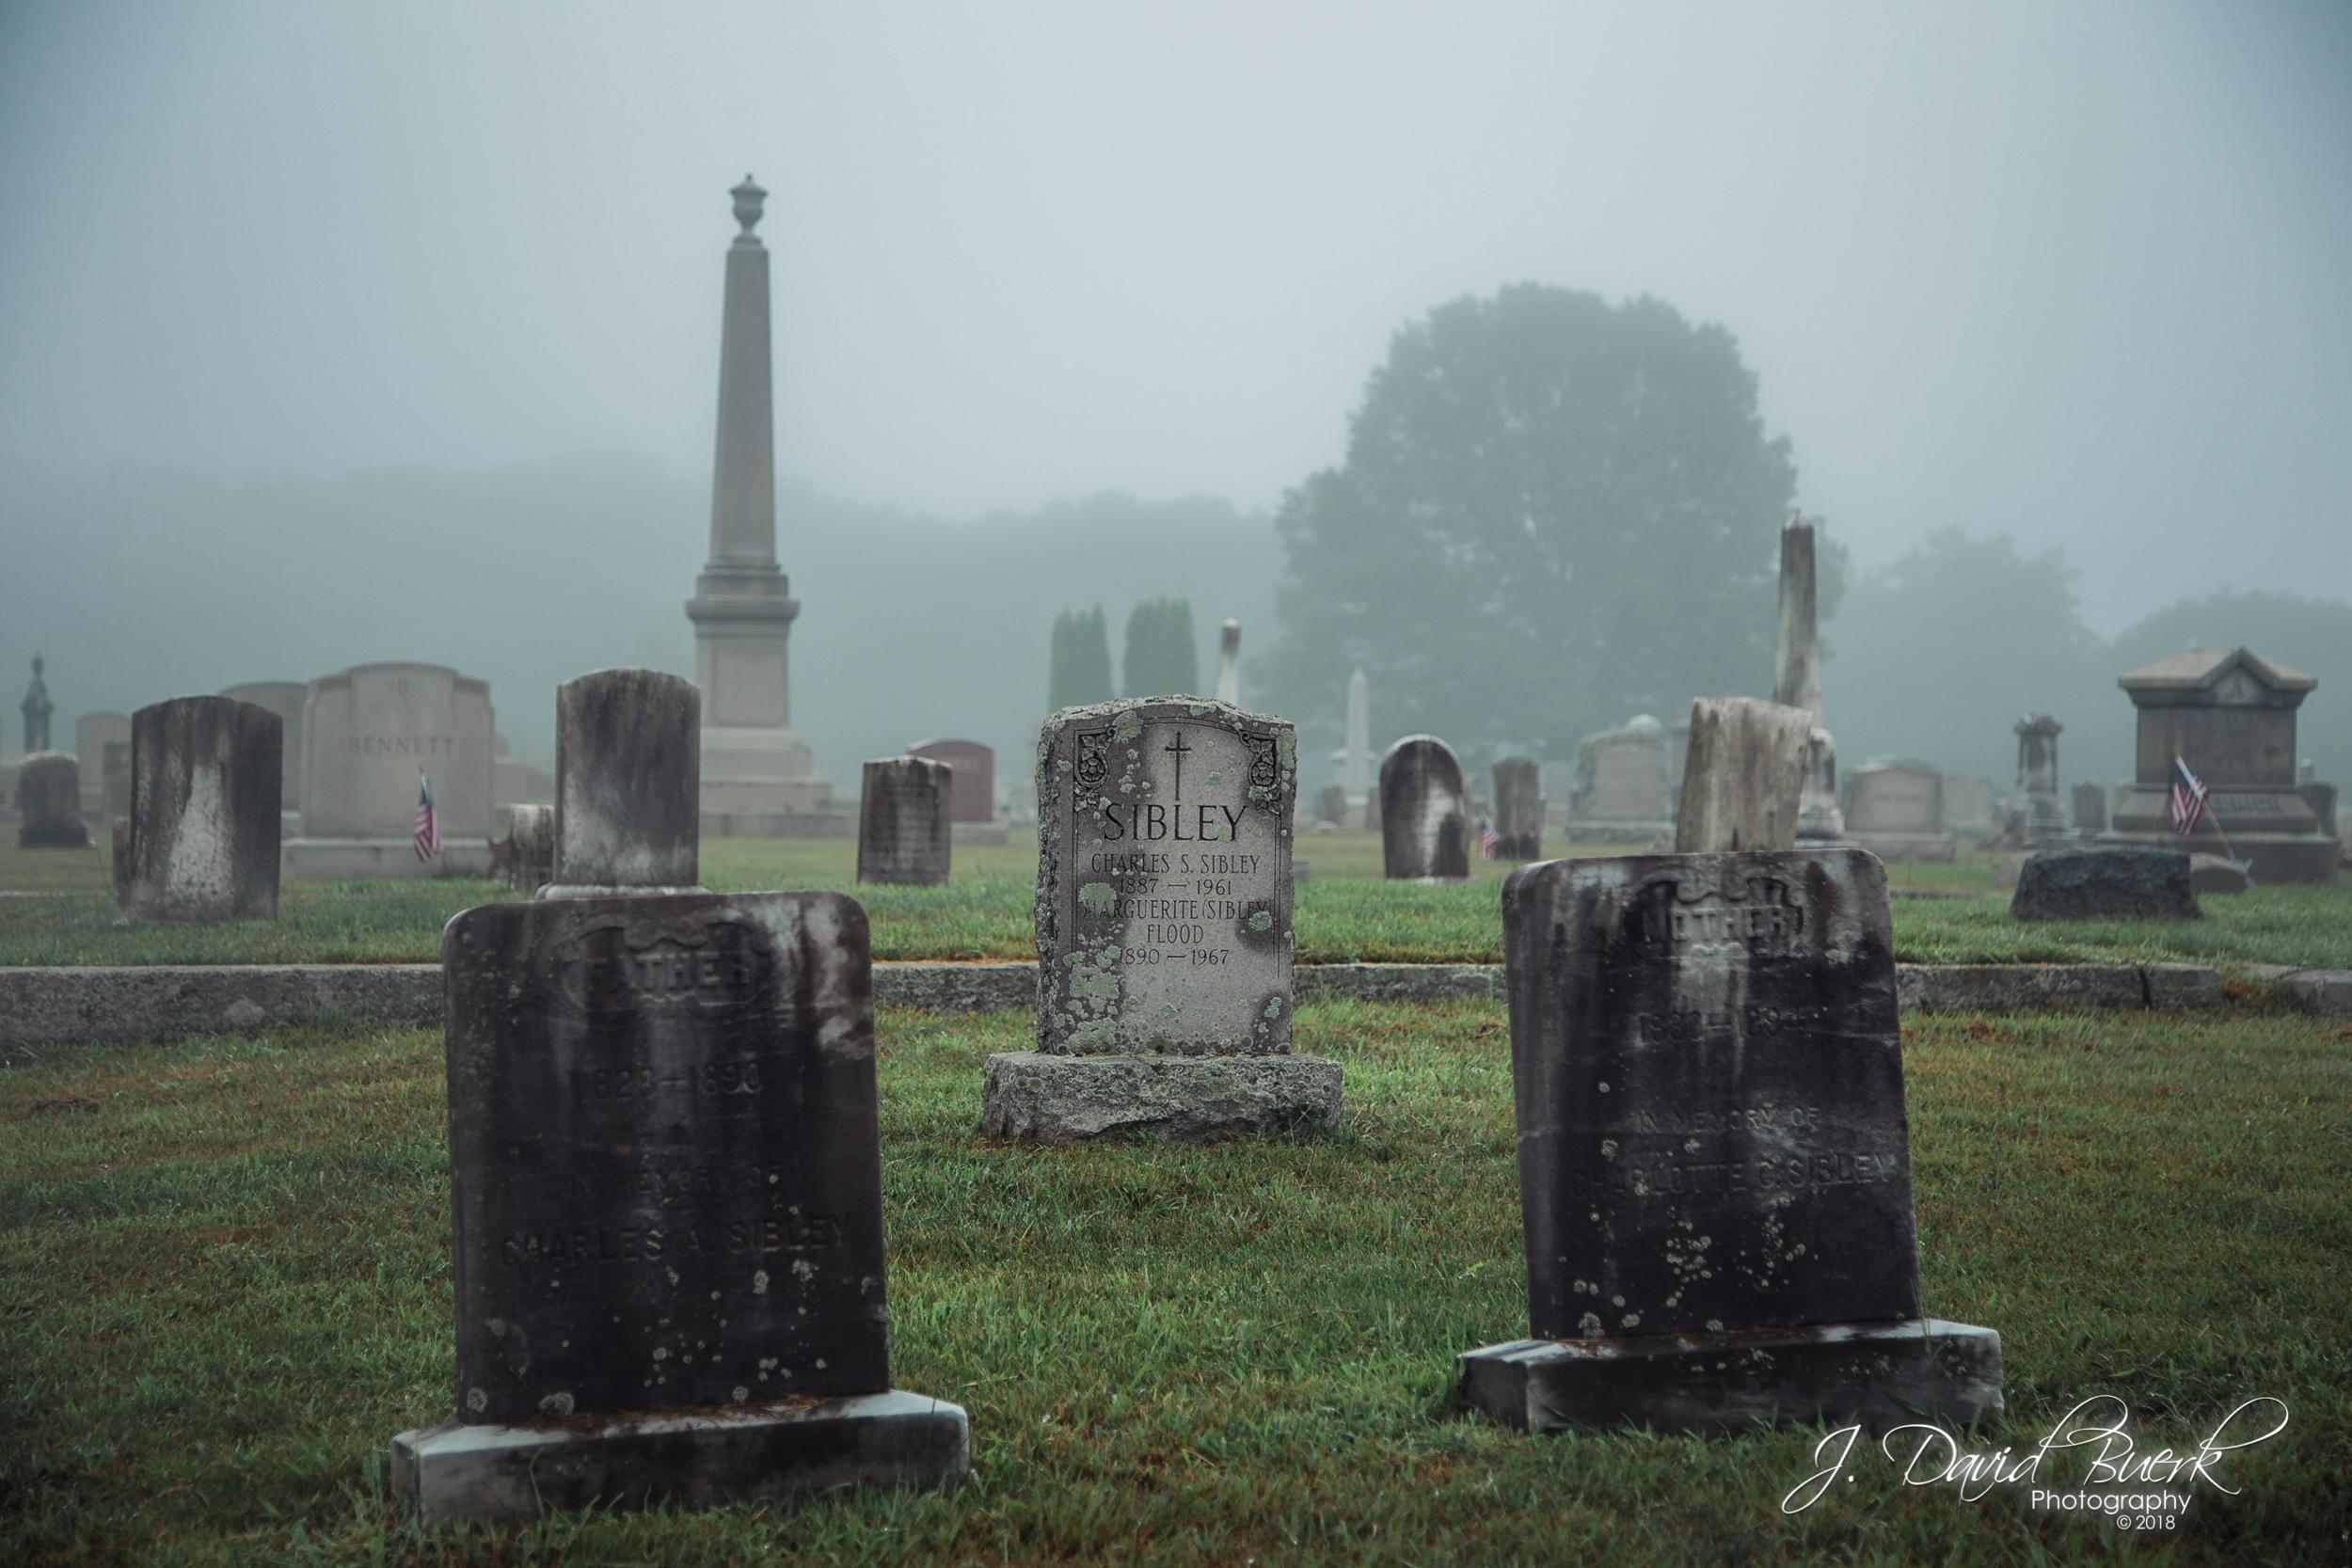 Headstones in the fog, seen in Union Cemetery, North Smithfield, Rhode Island.